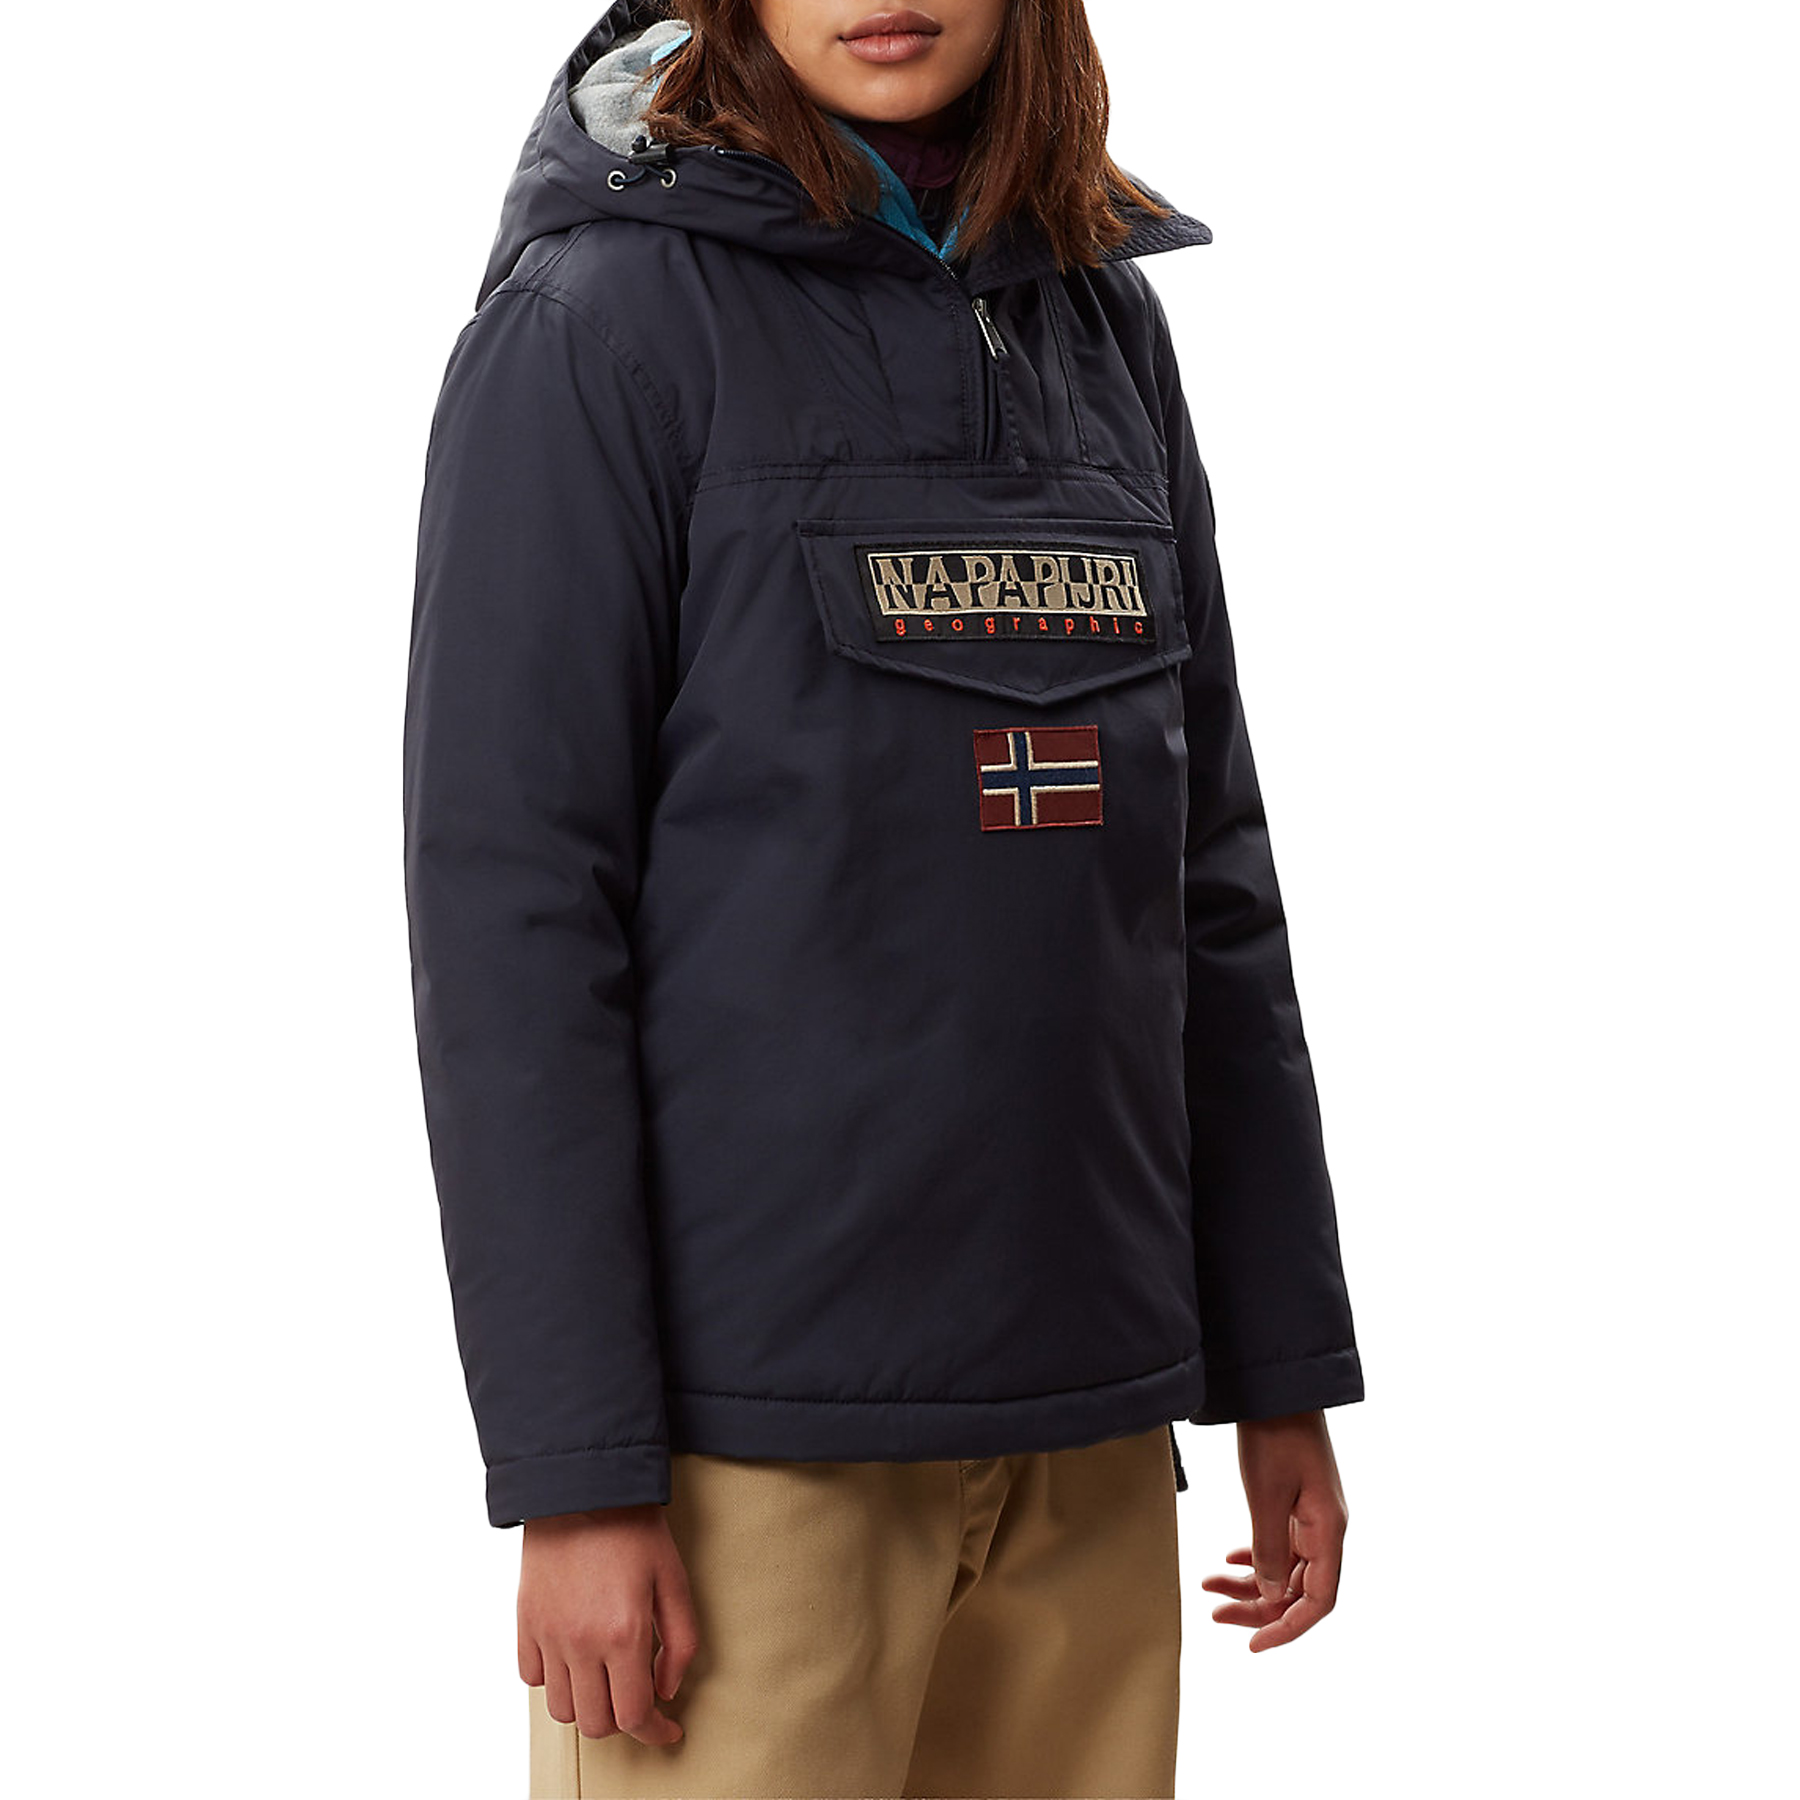 Napapijri Rainforest Winter 3 Women's Jacket Blu Marine